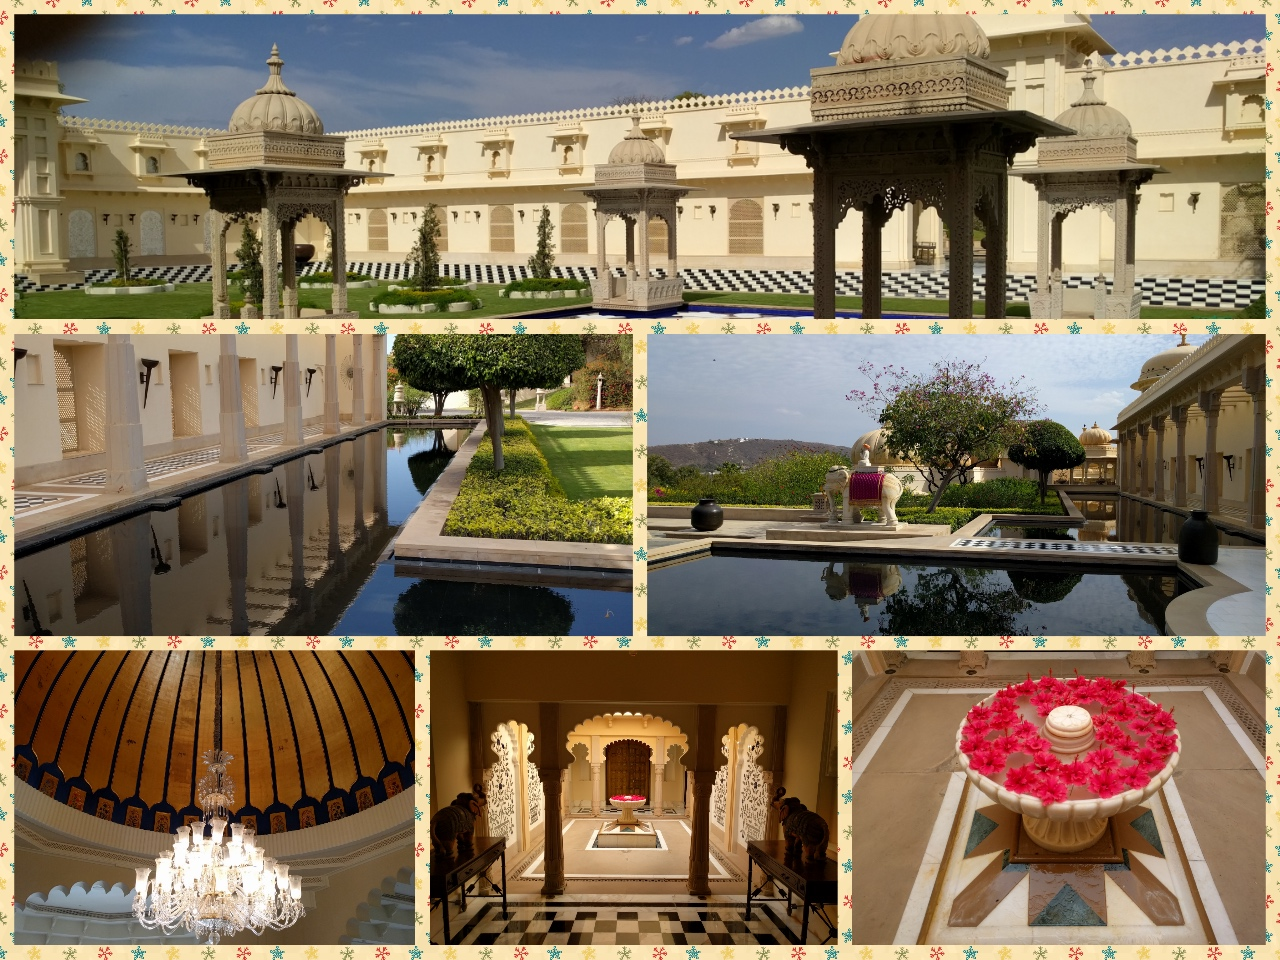 Palace Hotel, Corridors, Domes